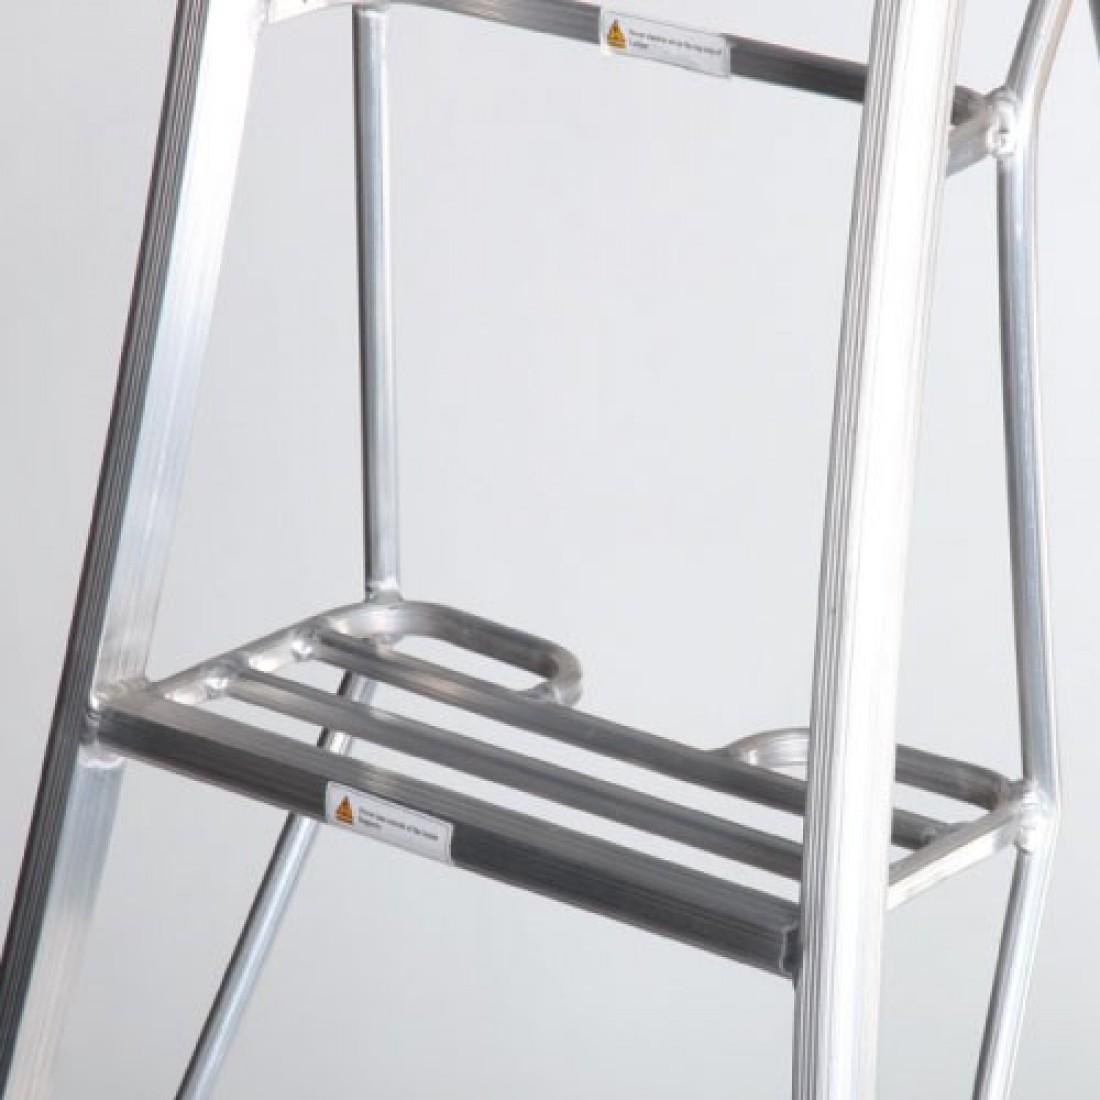 Henchman 3 Leg Adjustable Tripod Ladder Sorbus International